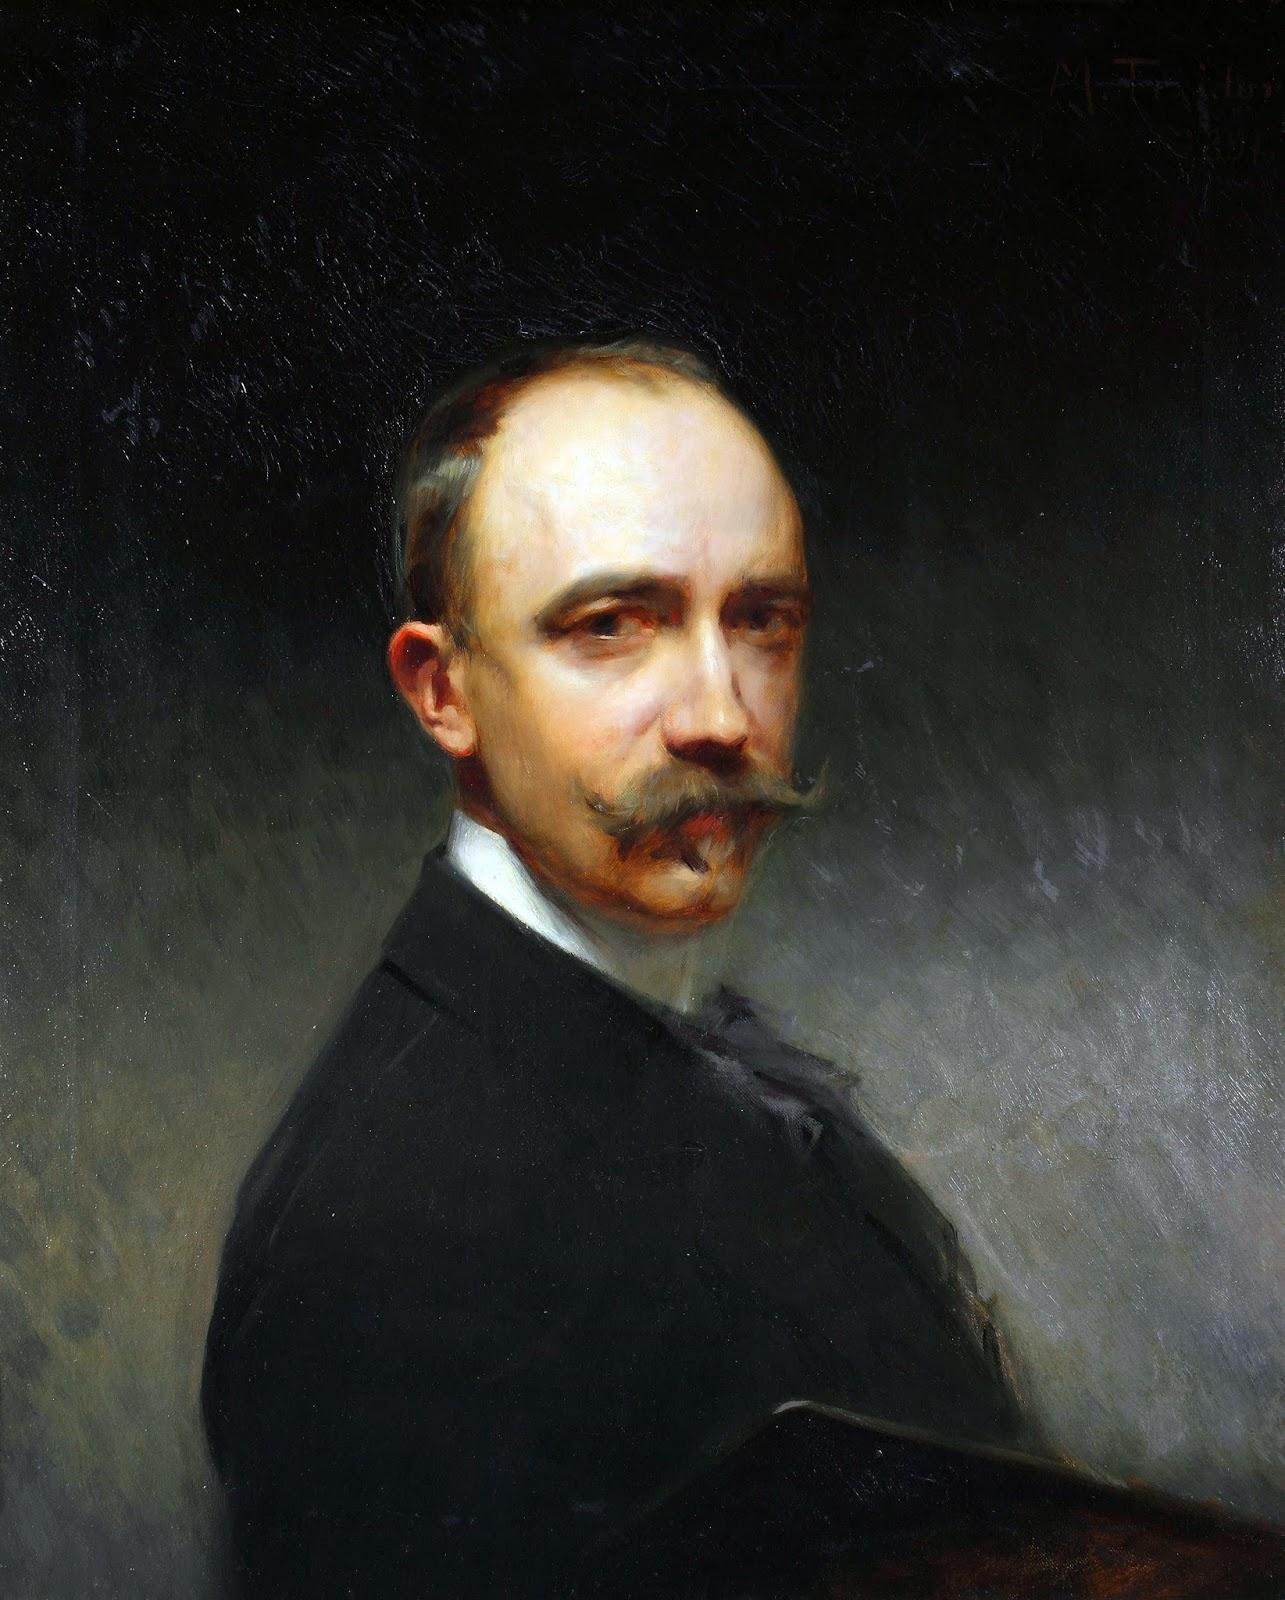 Modest Teixidor, Self Portrait, Portraits of Painters, Fine arts, Portraits of painters blog, Paintings of Modest Teixidor, Painter Modest Teixidor